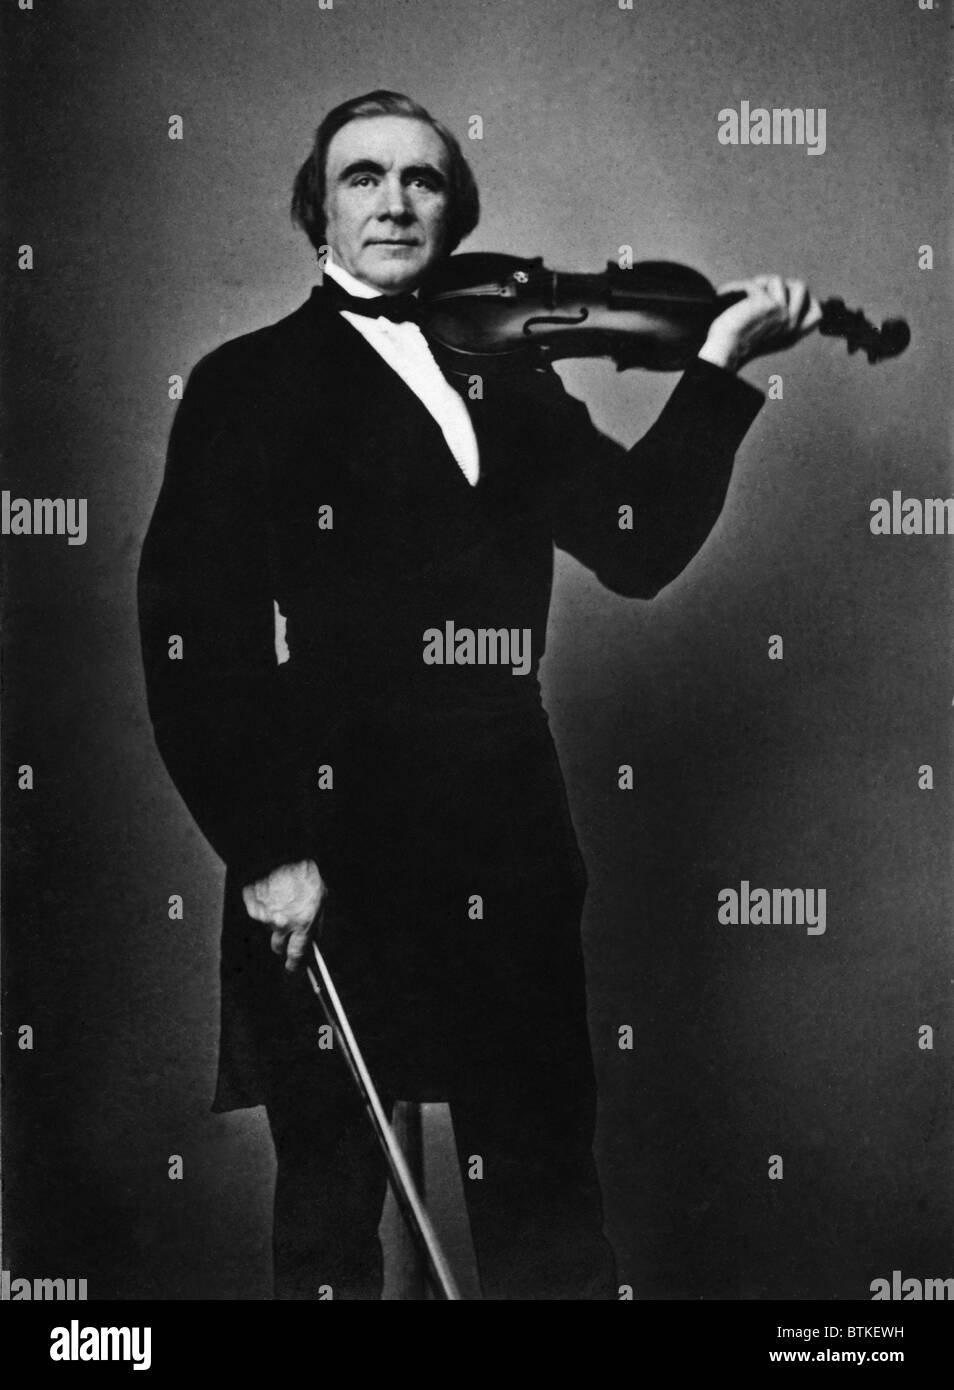 Ole Borneman Bull (1810-1880), Norwegian virtuoso violinist was an international musical star in Europe and America. - Stock Image